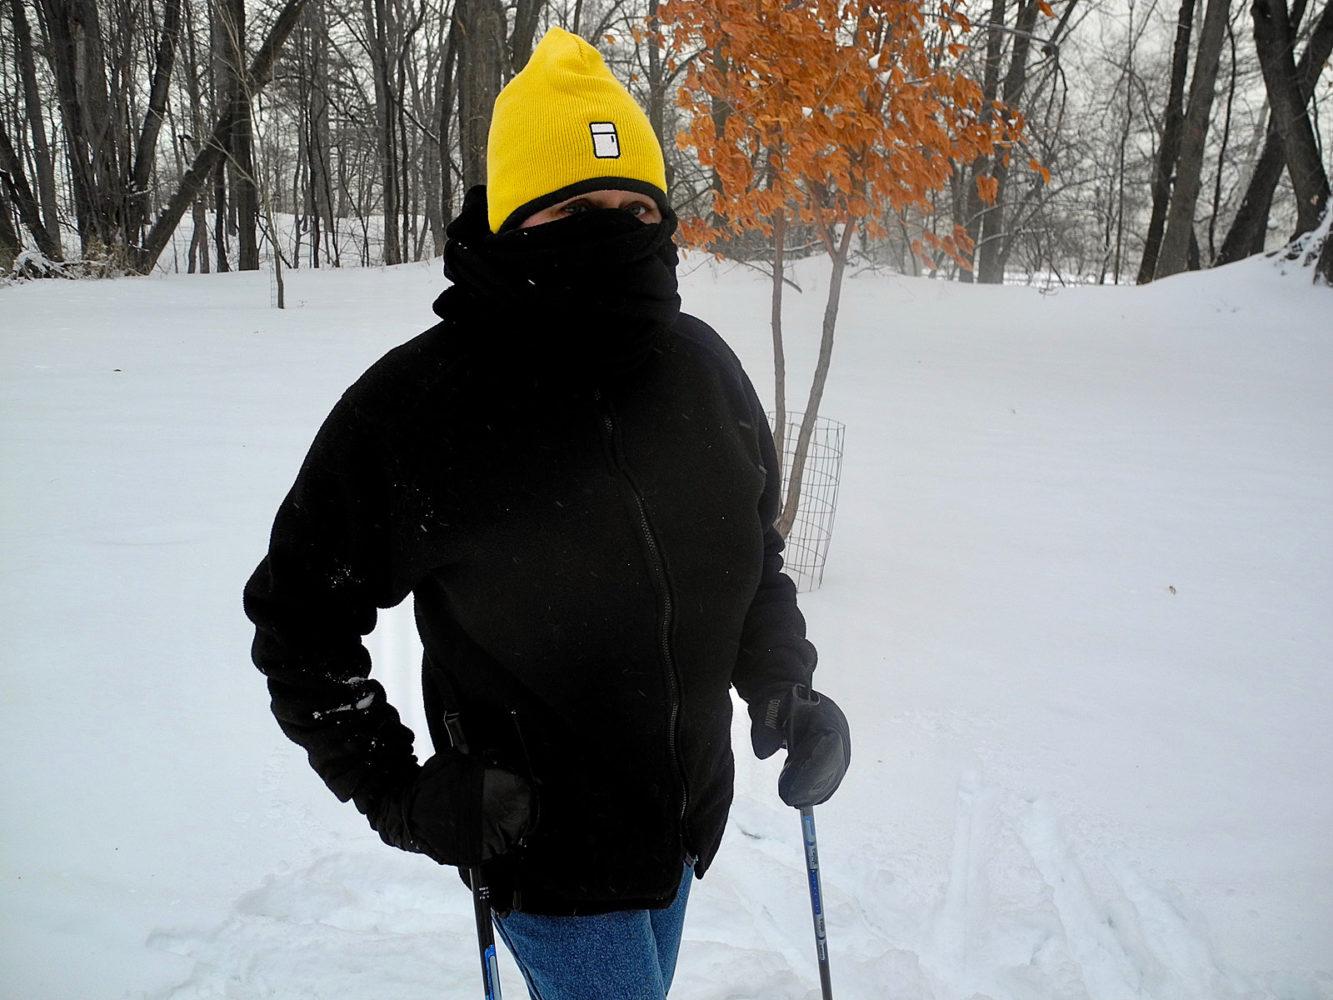 Peggi skiing with Refrigerator Hat